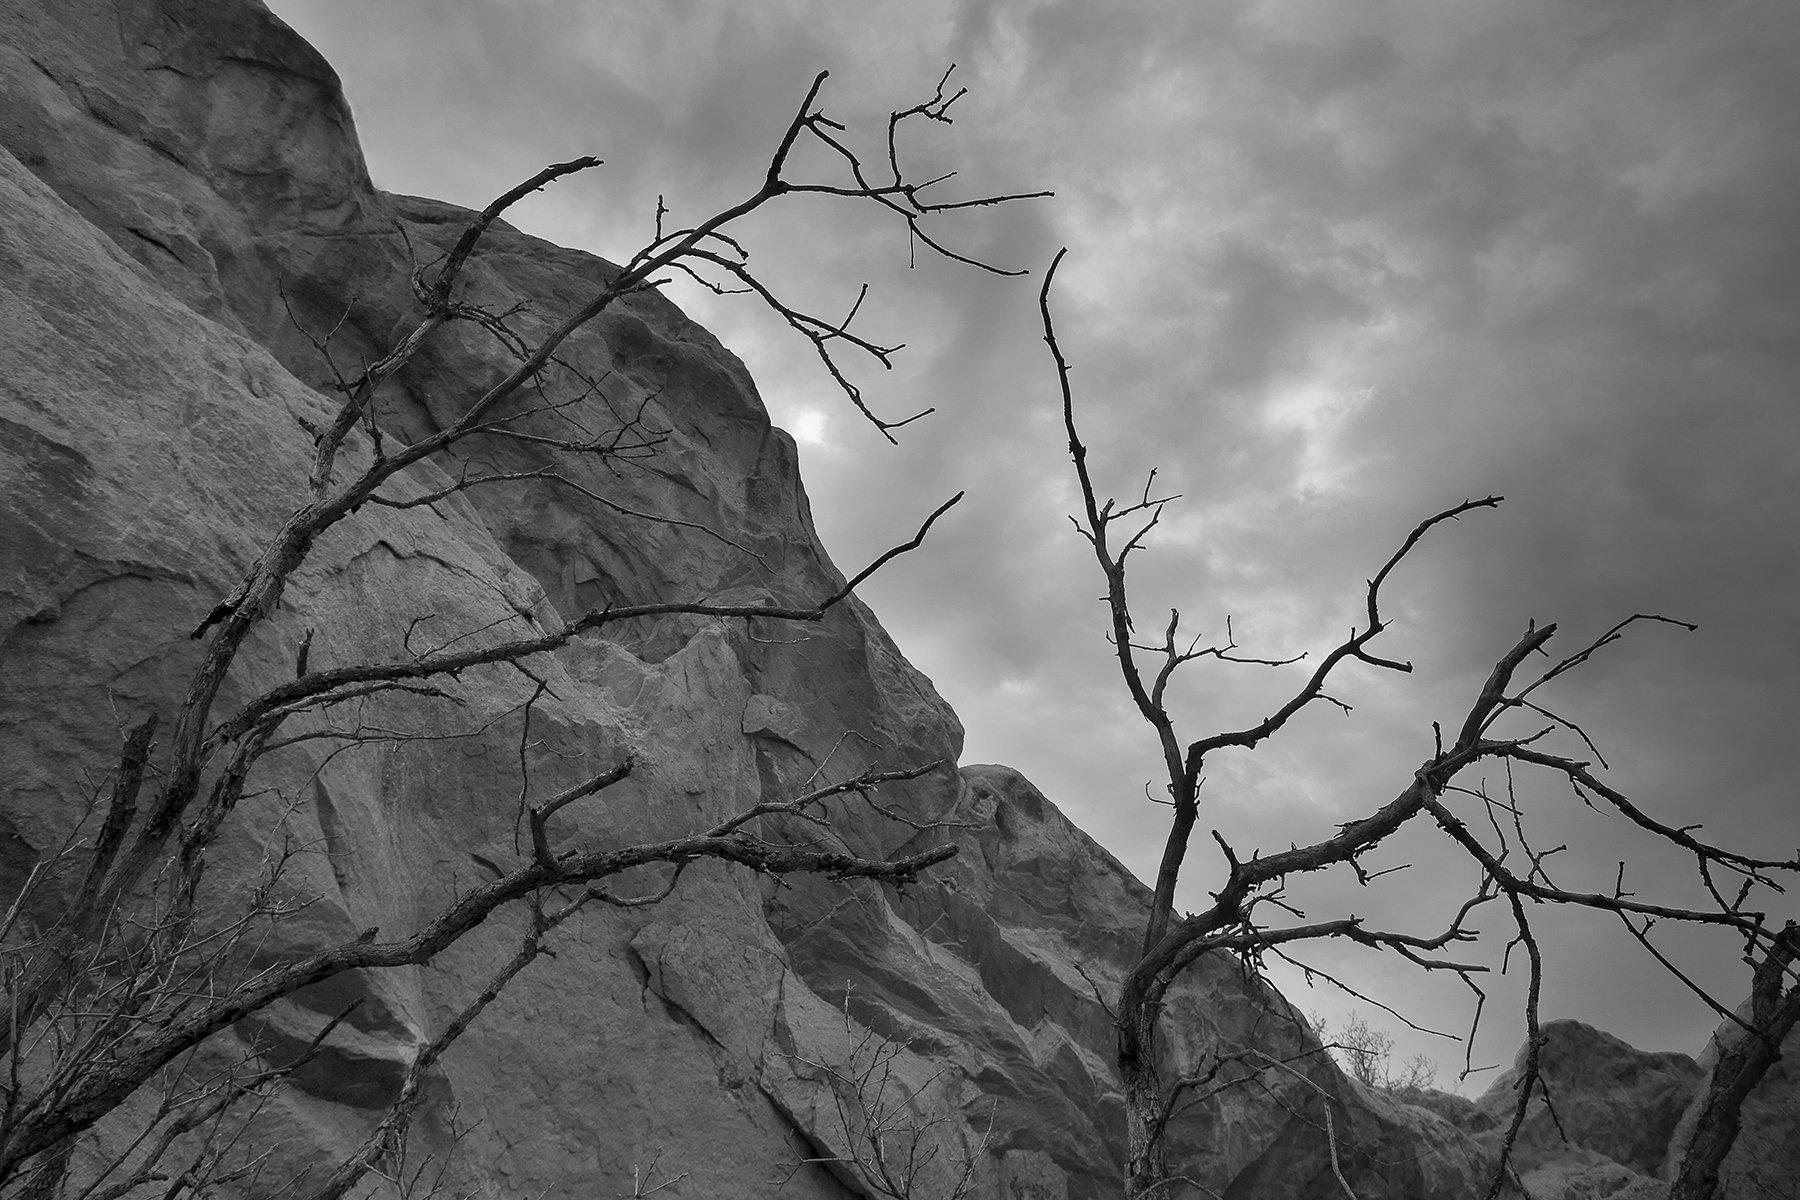 colorado-springs-landscape-black-and-white032.jpg